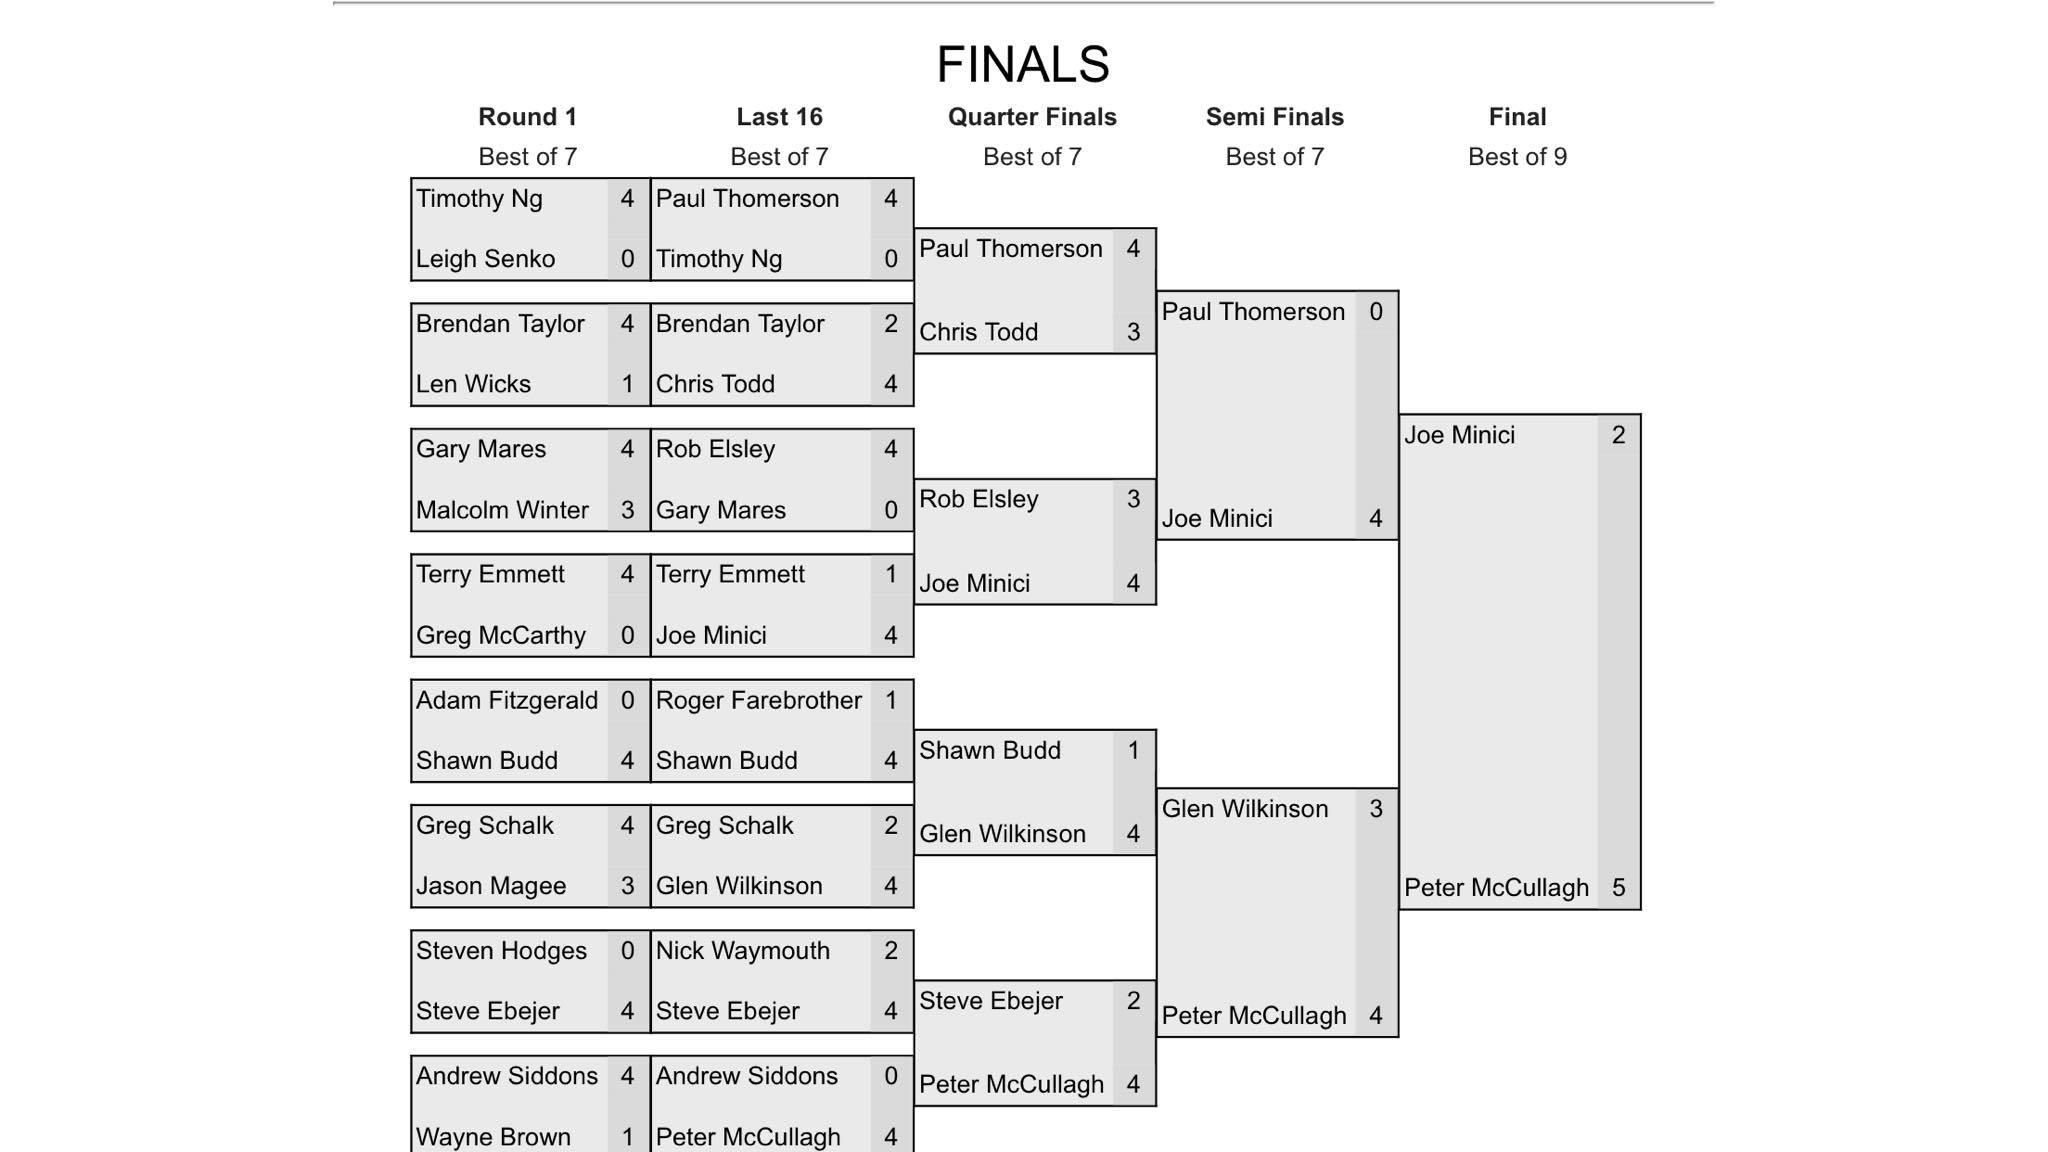 Australian Masters 2019 Final Draw.jpg